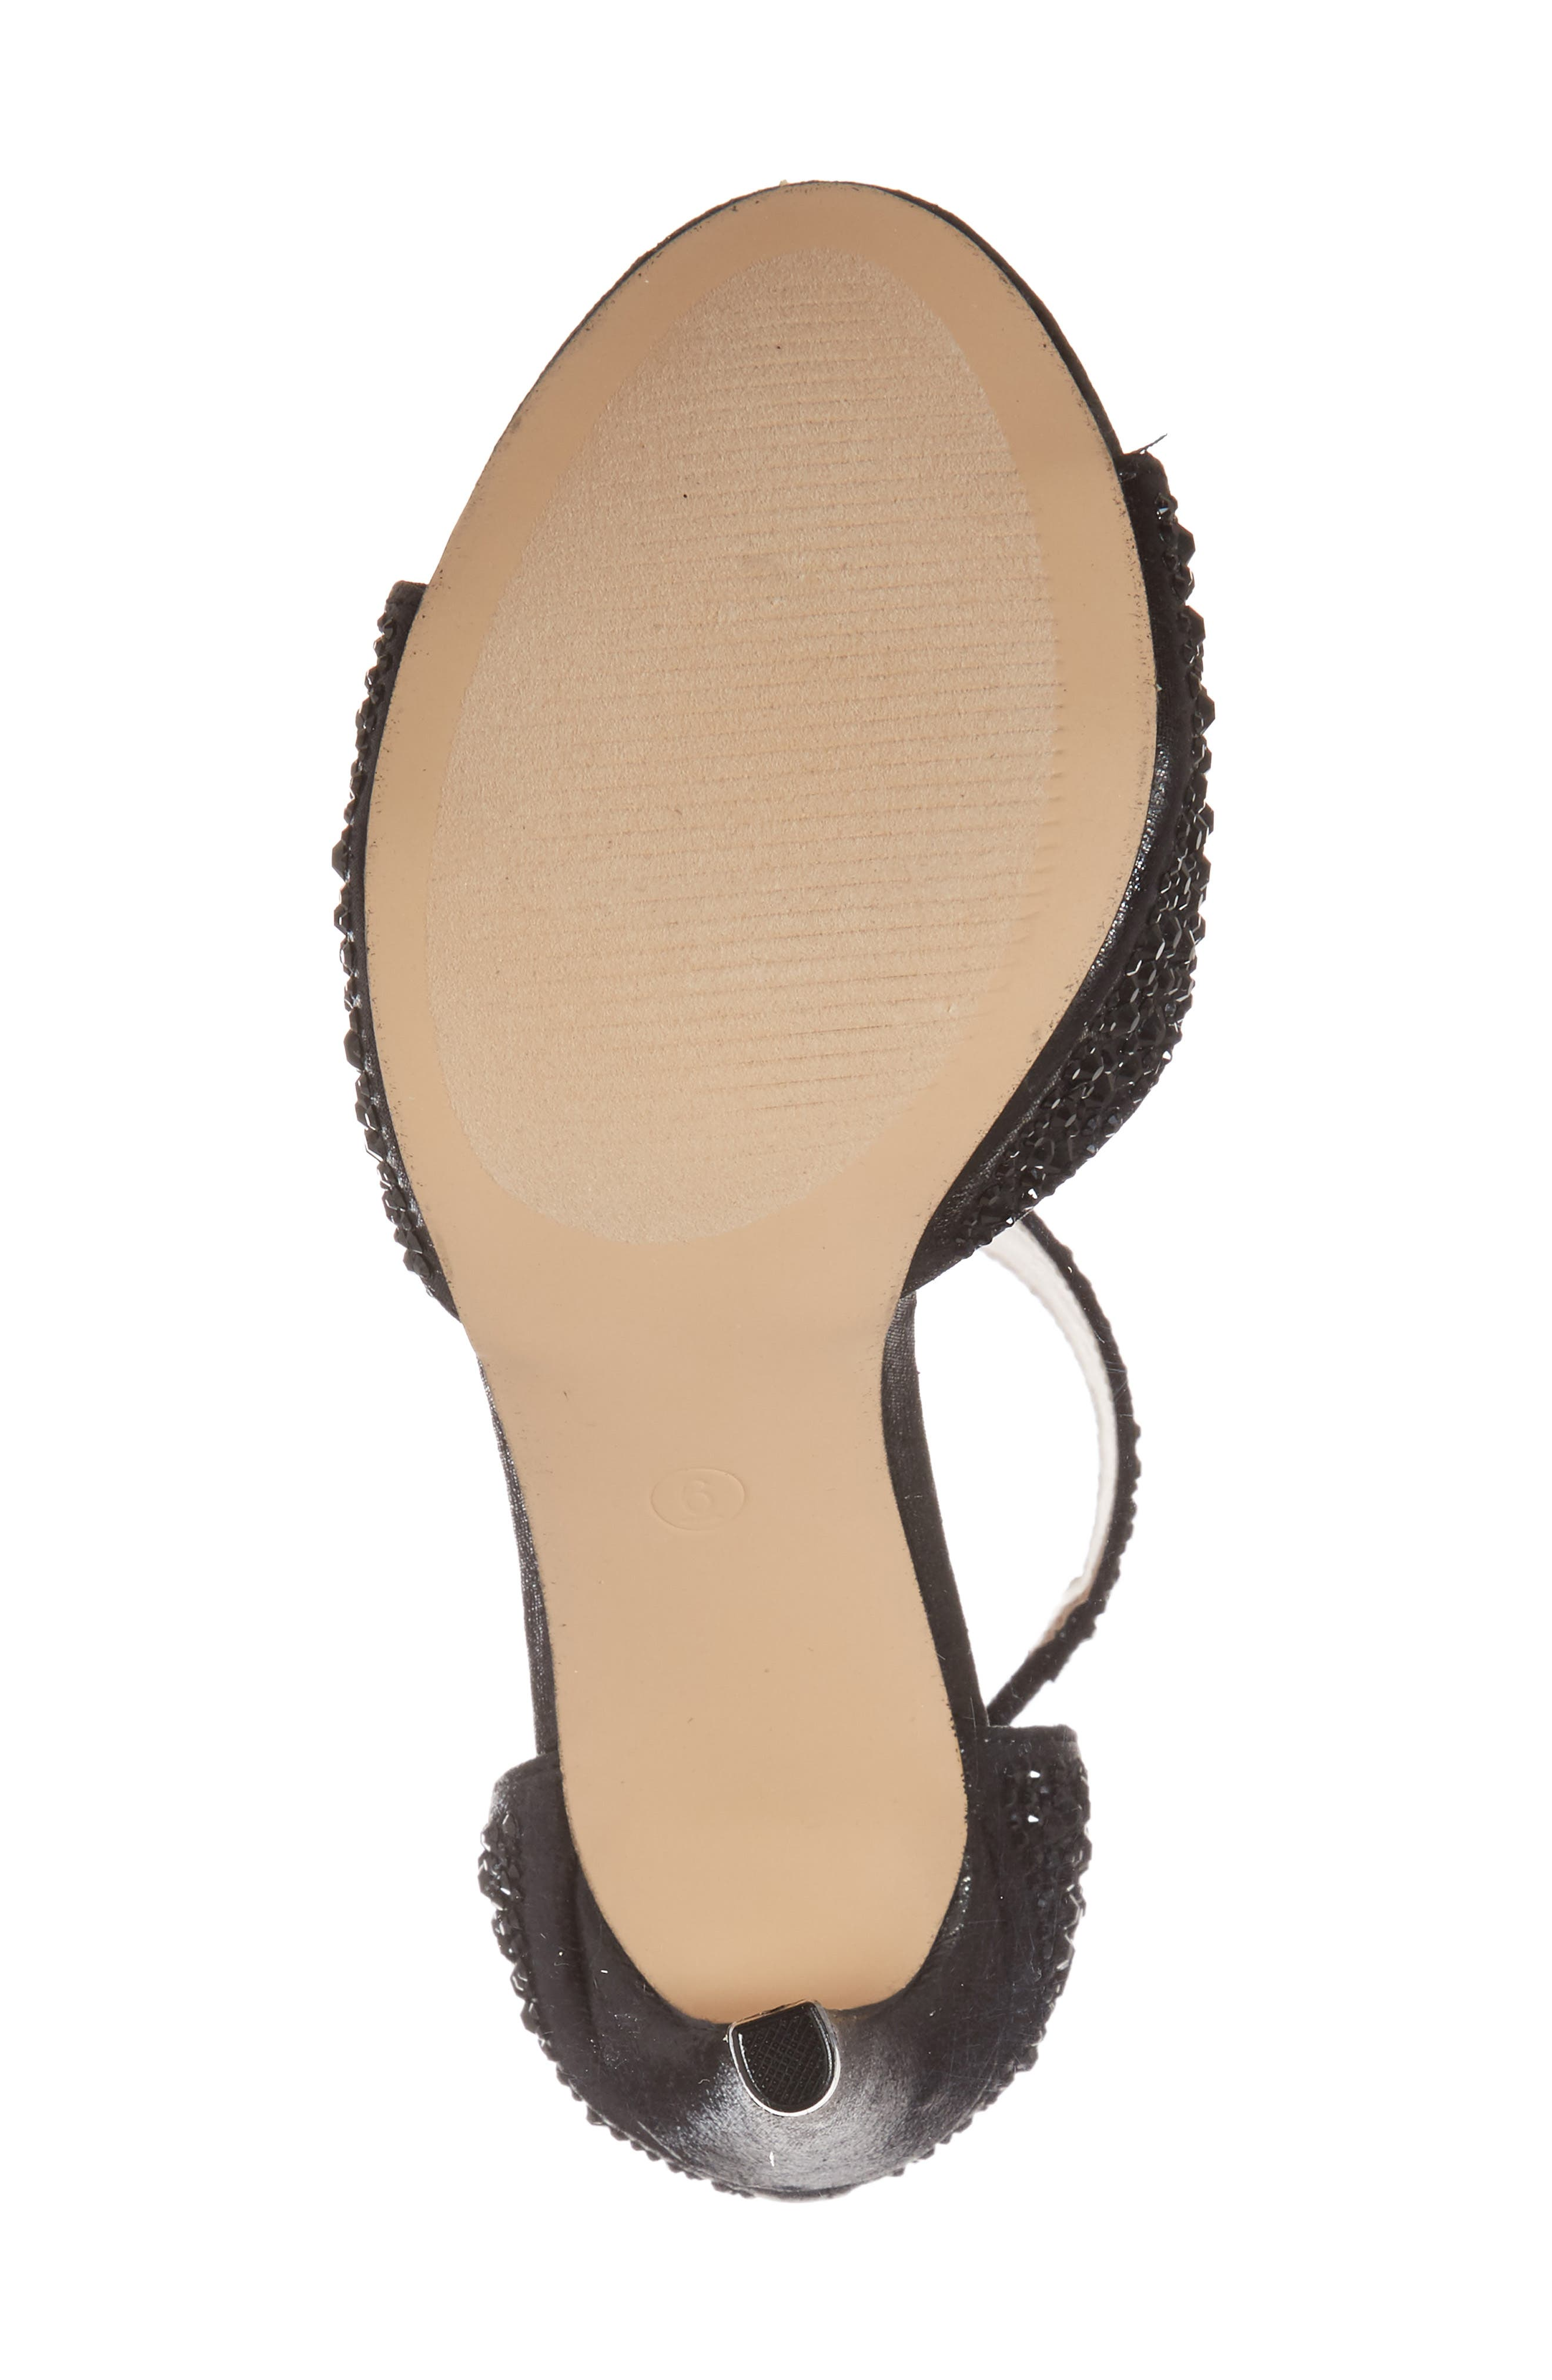 LAUREN LORRAINE, Ina Crystal Embellished Sandal, Alternate thumbnail 6, color, 001